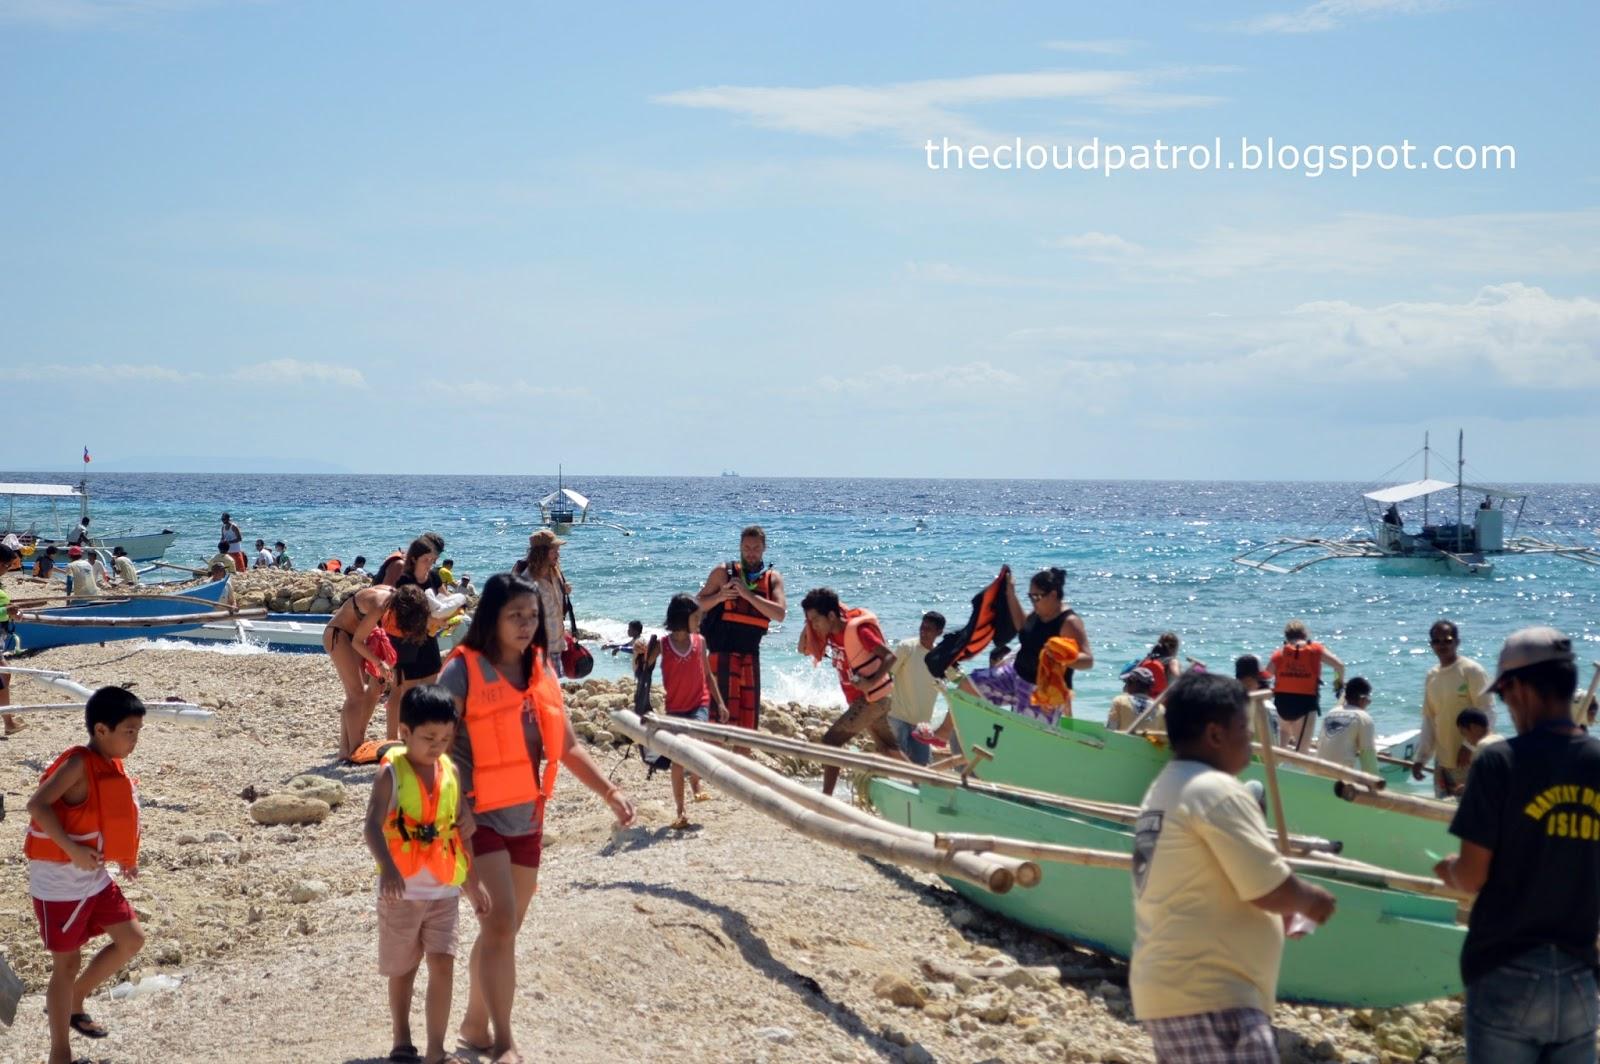 Butanding, whale shark, cebu, oslob, philippines, white sand, vacation, beach